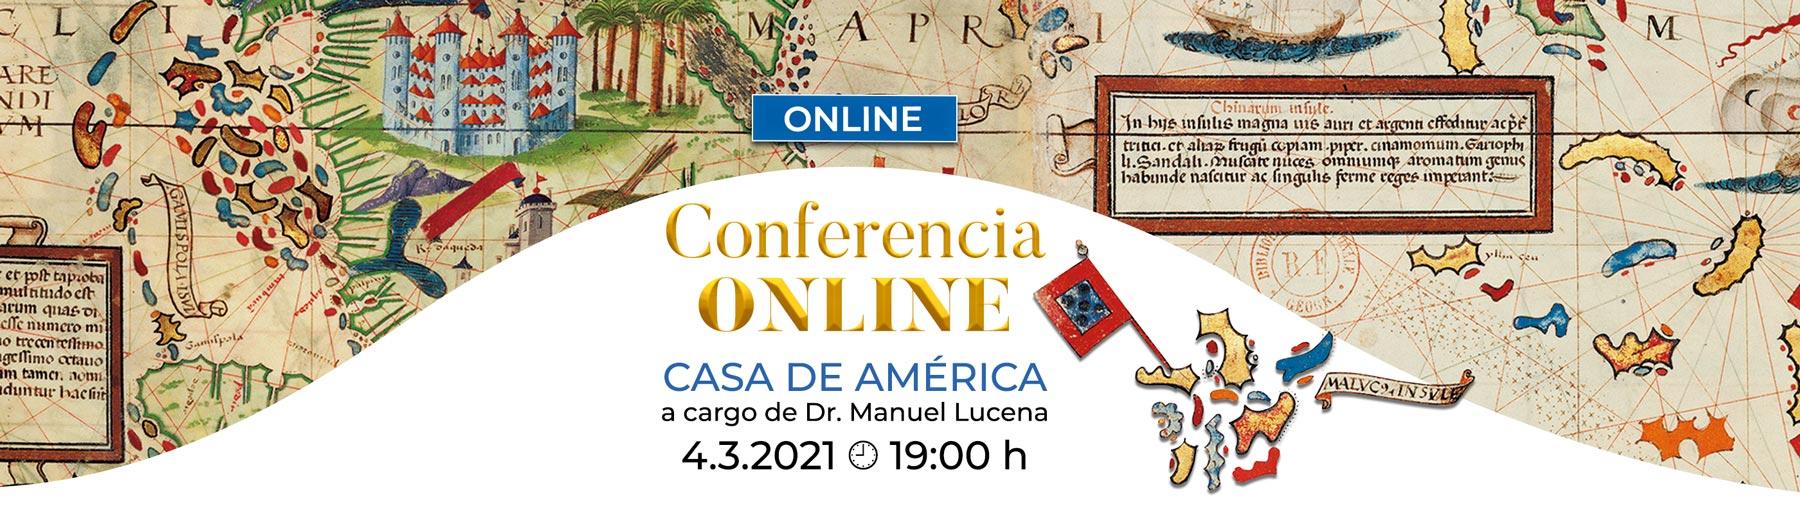 Conferencia online Casa de América a cargo de Dr. Manuel Lucena. 4 de marzo a las 19 h